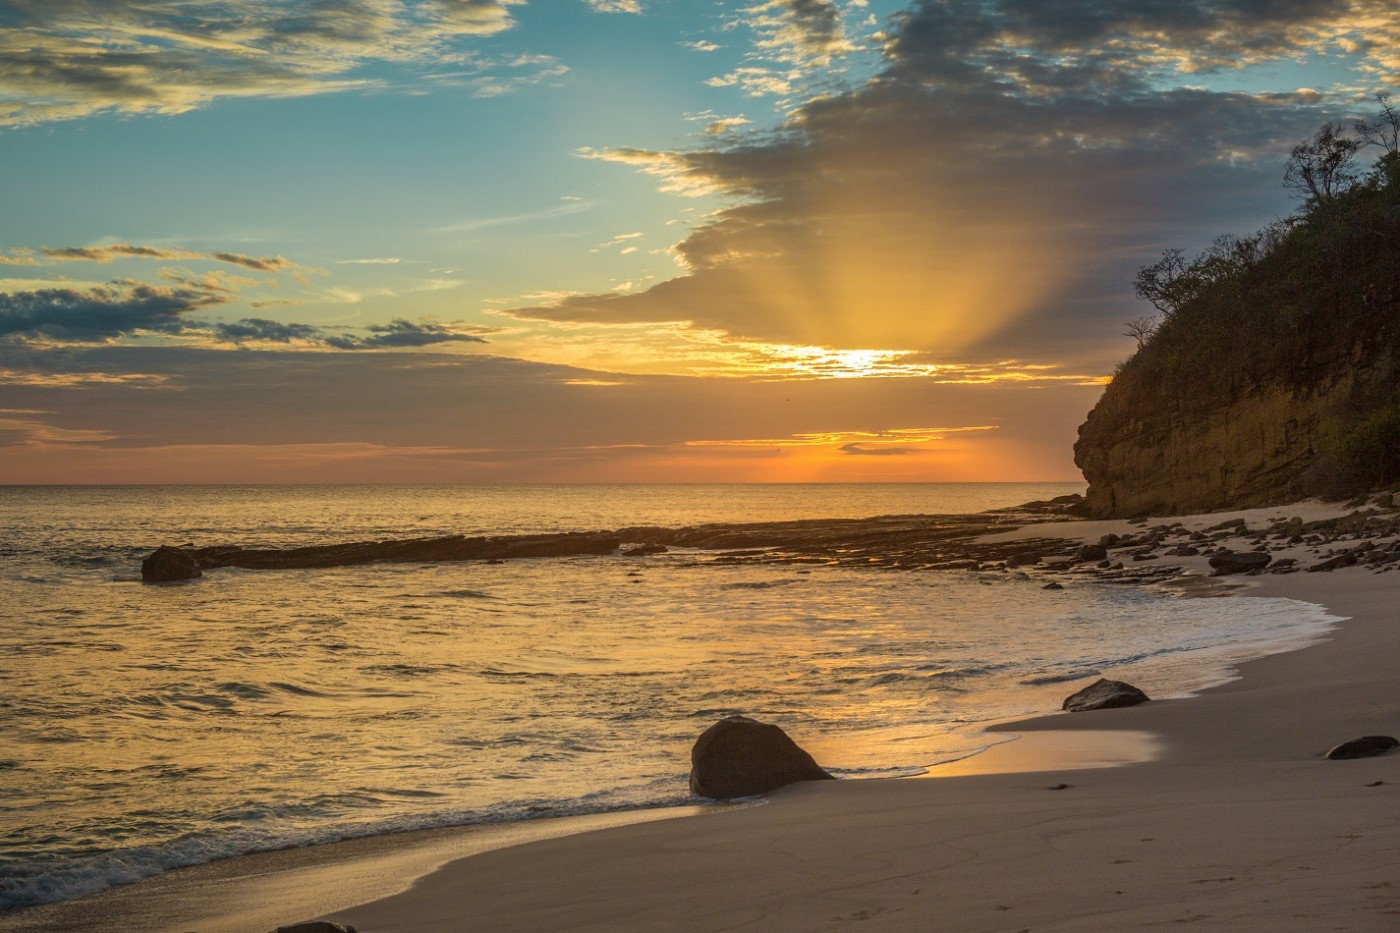 Playa-Escondida-Nicaragua-1400x933-1.jpg